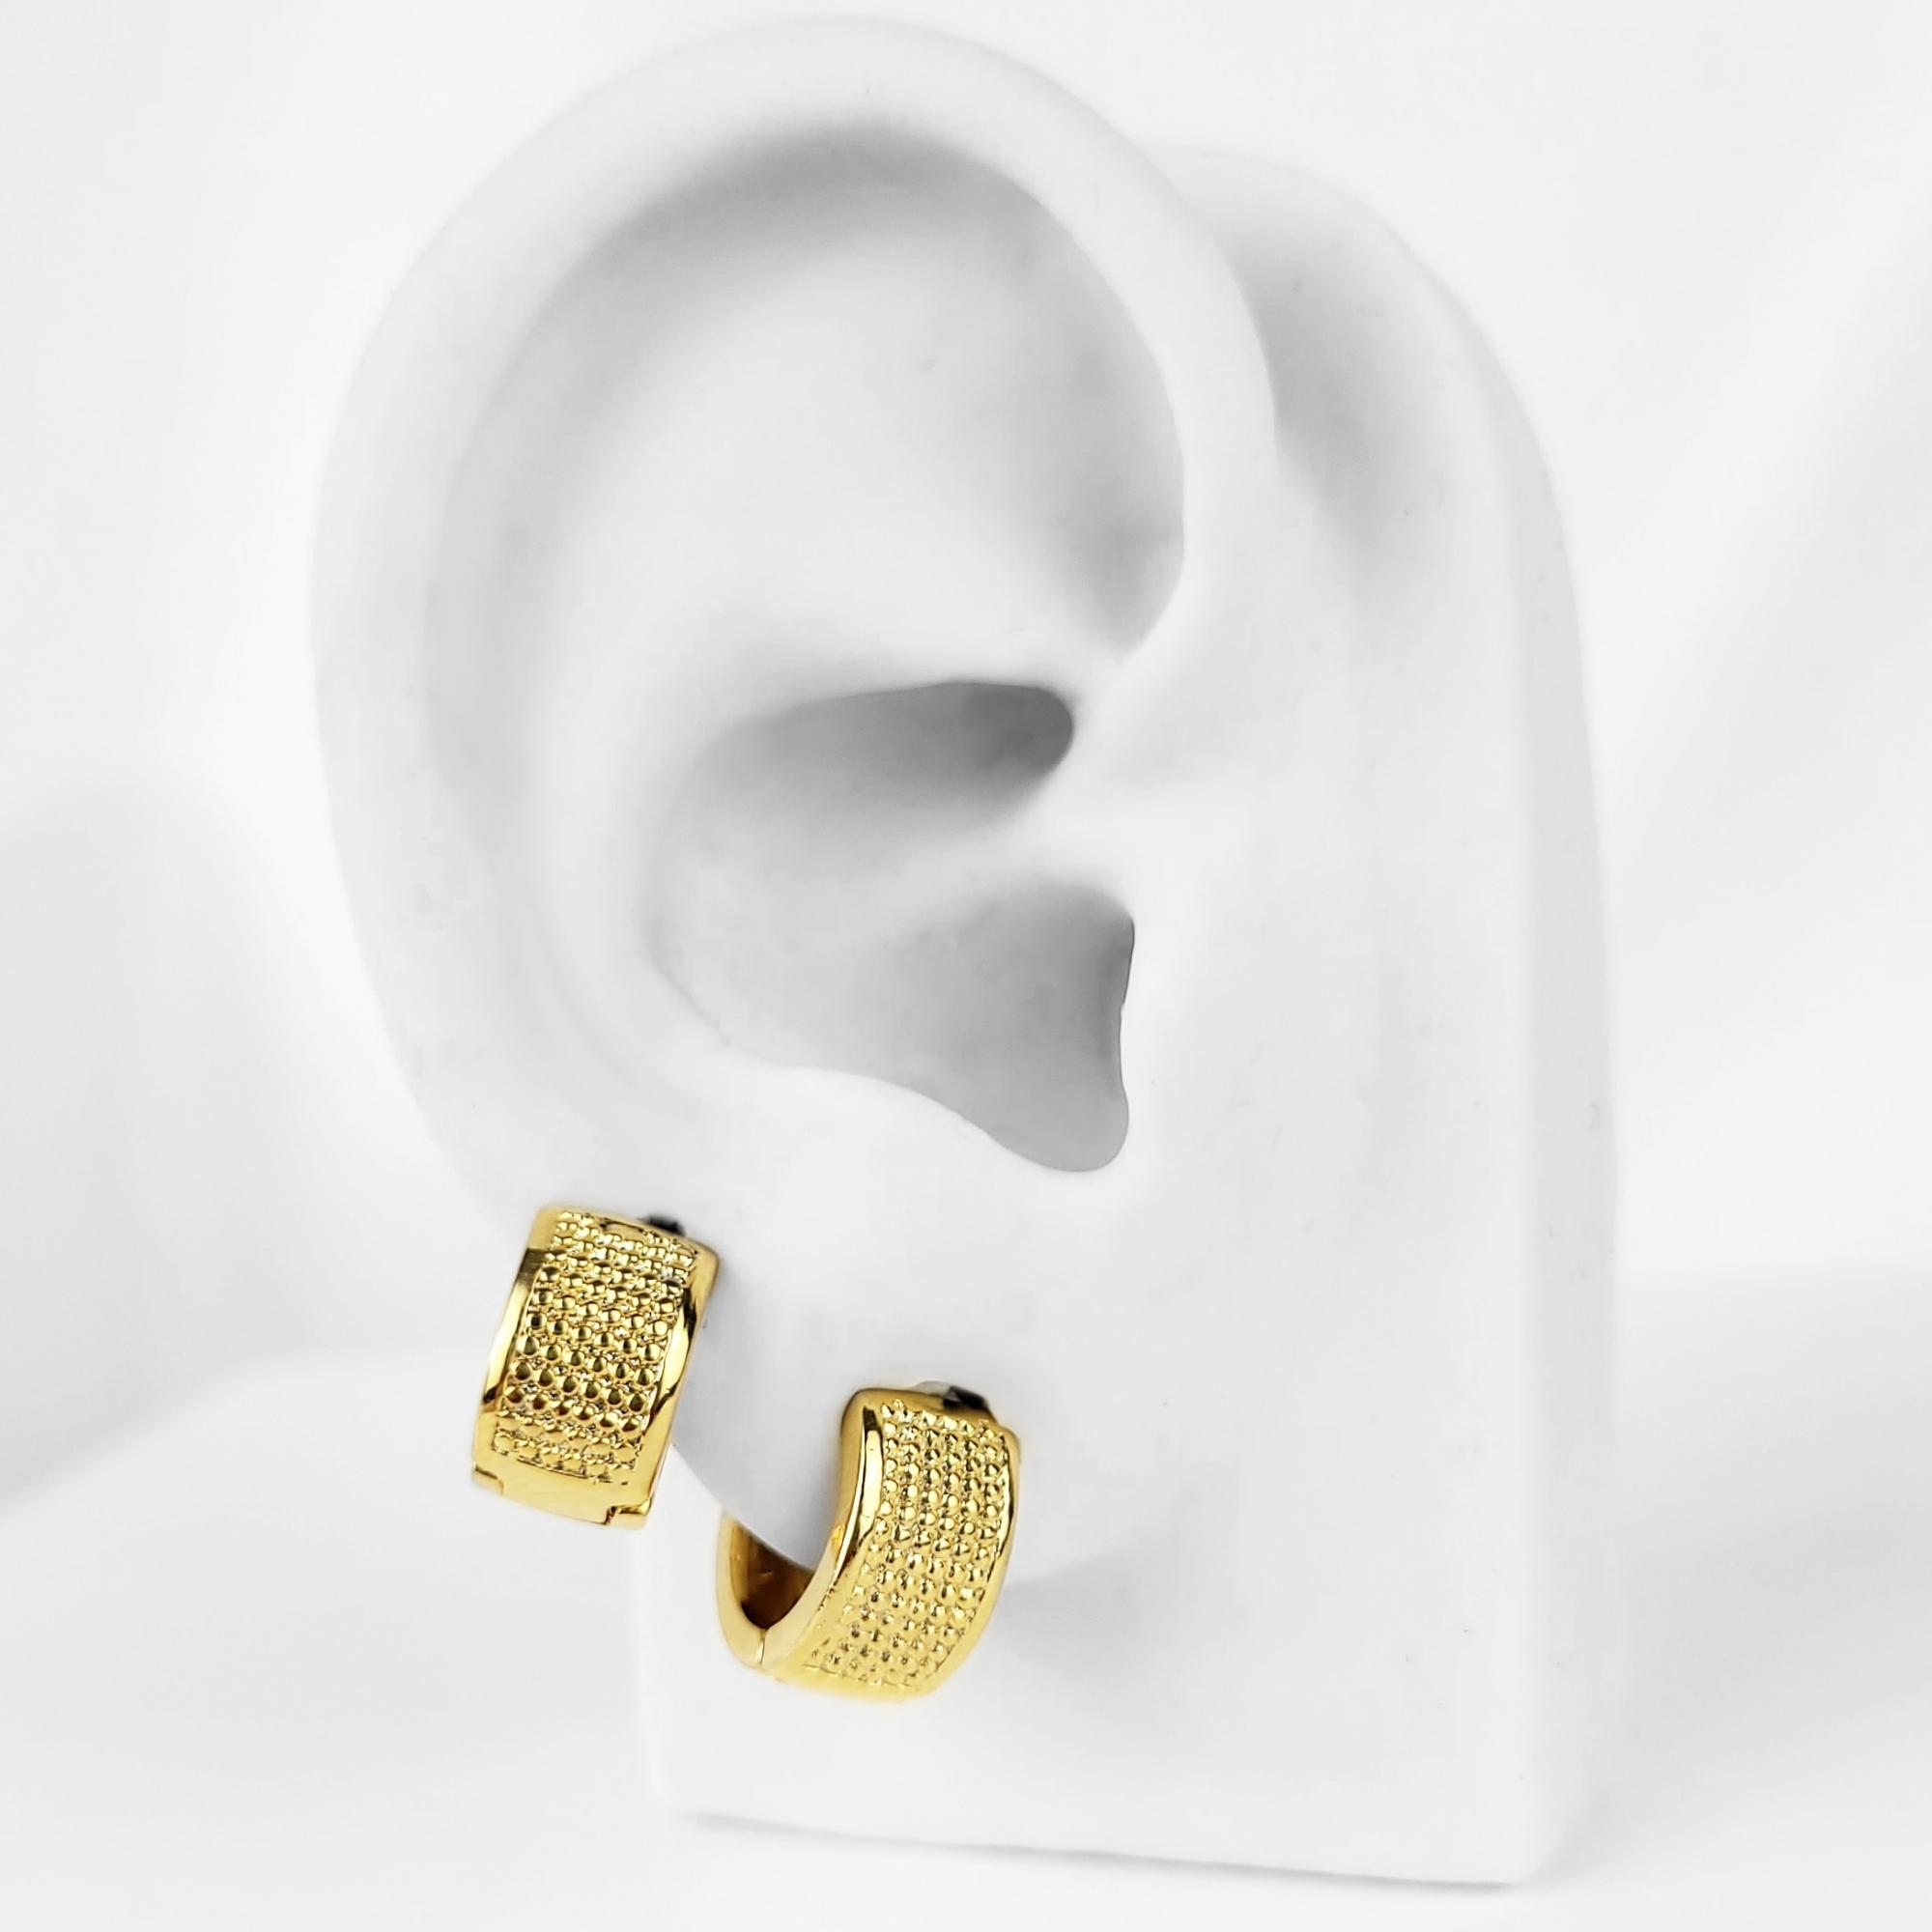 Duo de Brincos Argolas Largas Texturizadas Folheado Ouro 18K  - Lunozê Joias